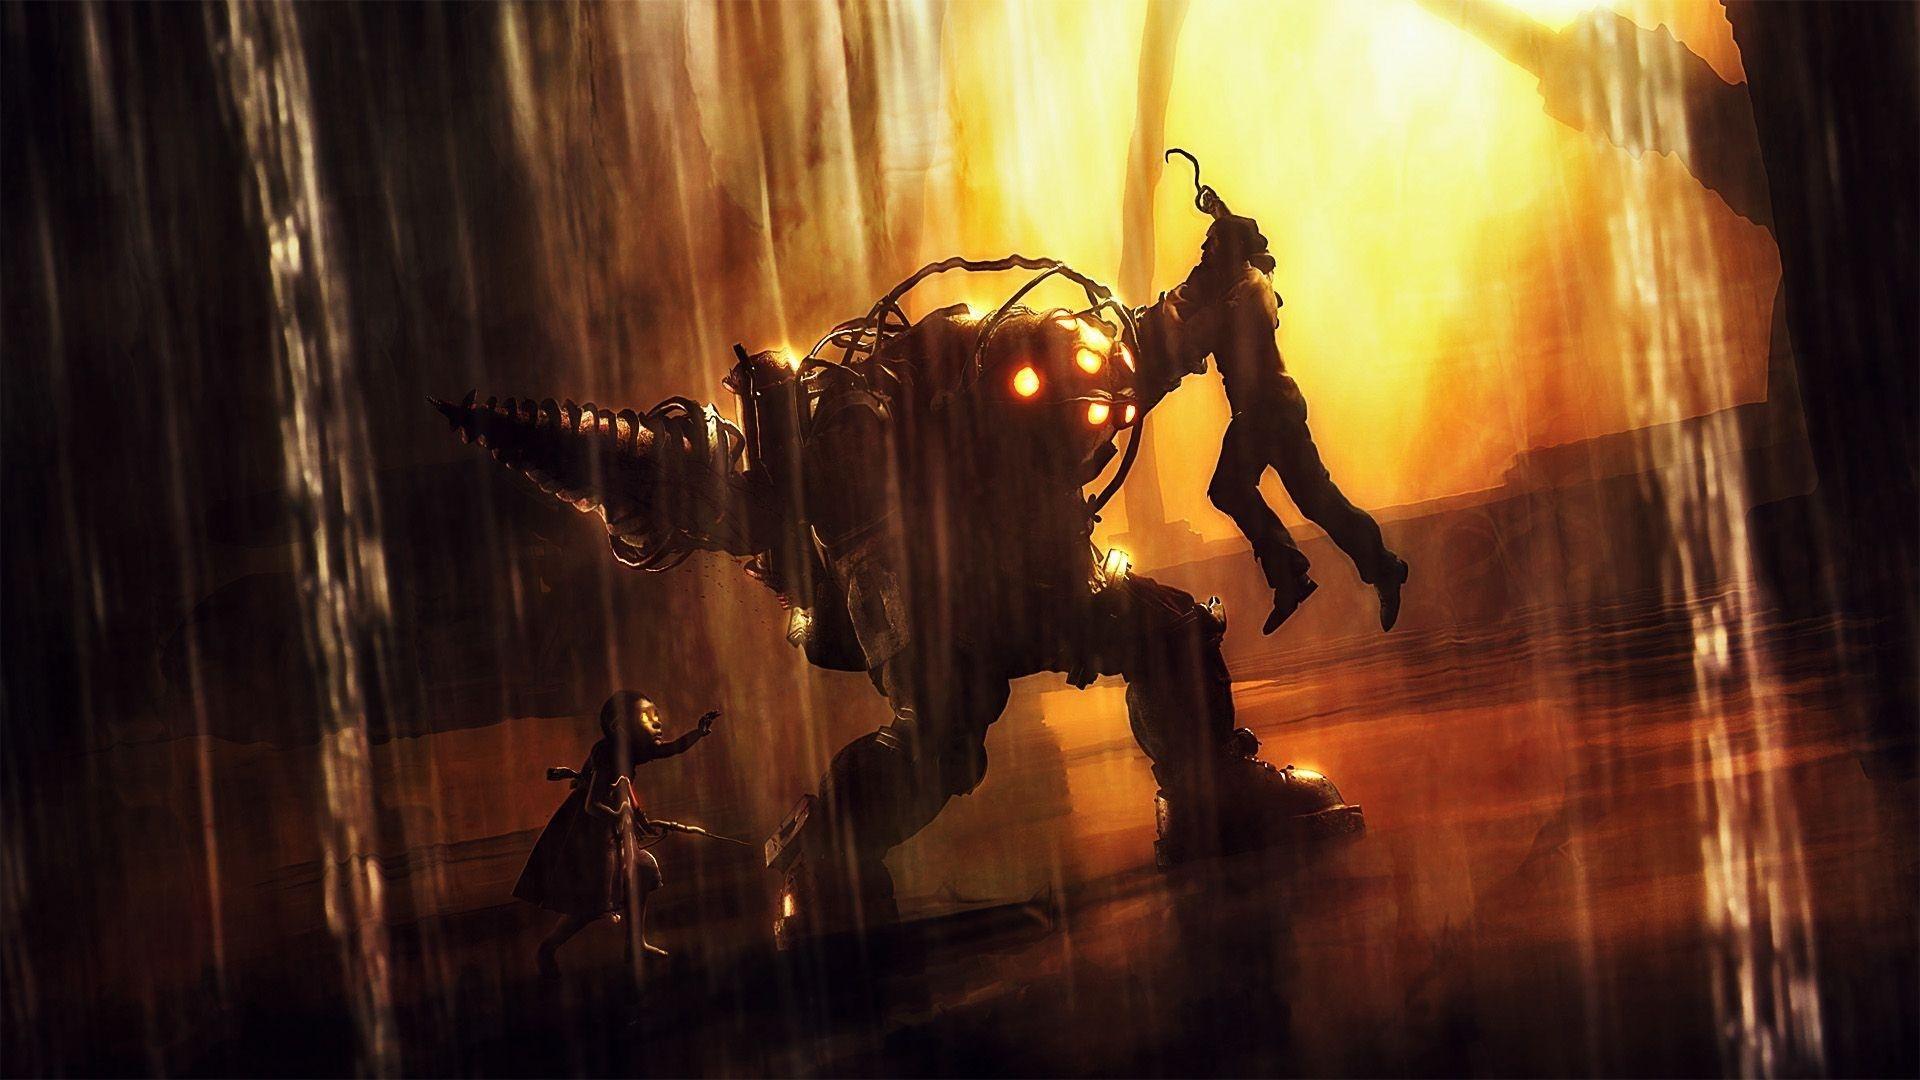 Full HD P Bioshock Wallpapers Desktop Backgrounds Wallpaper